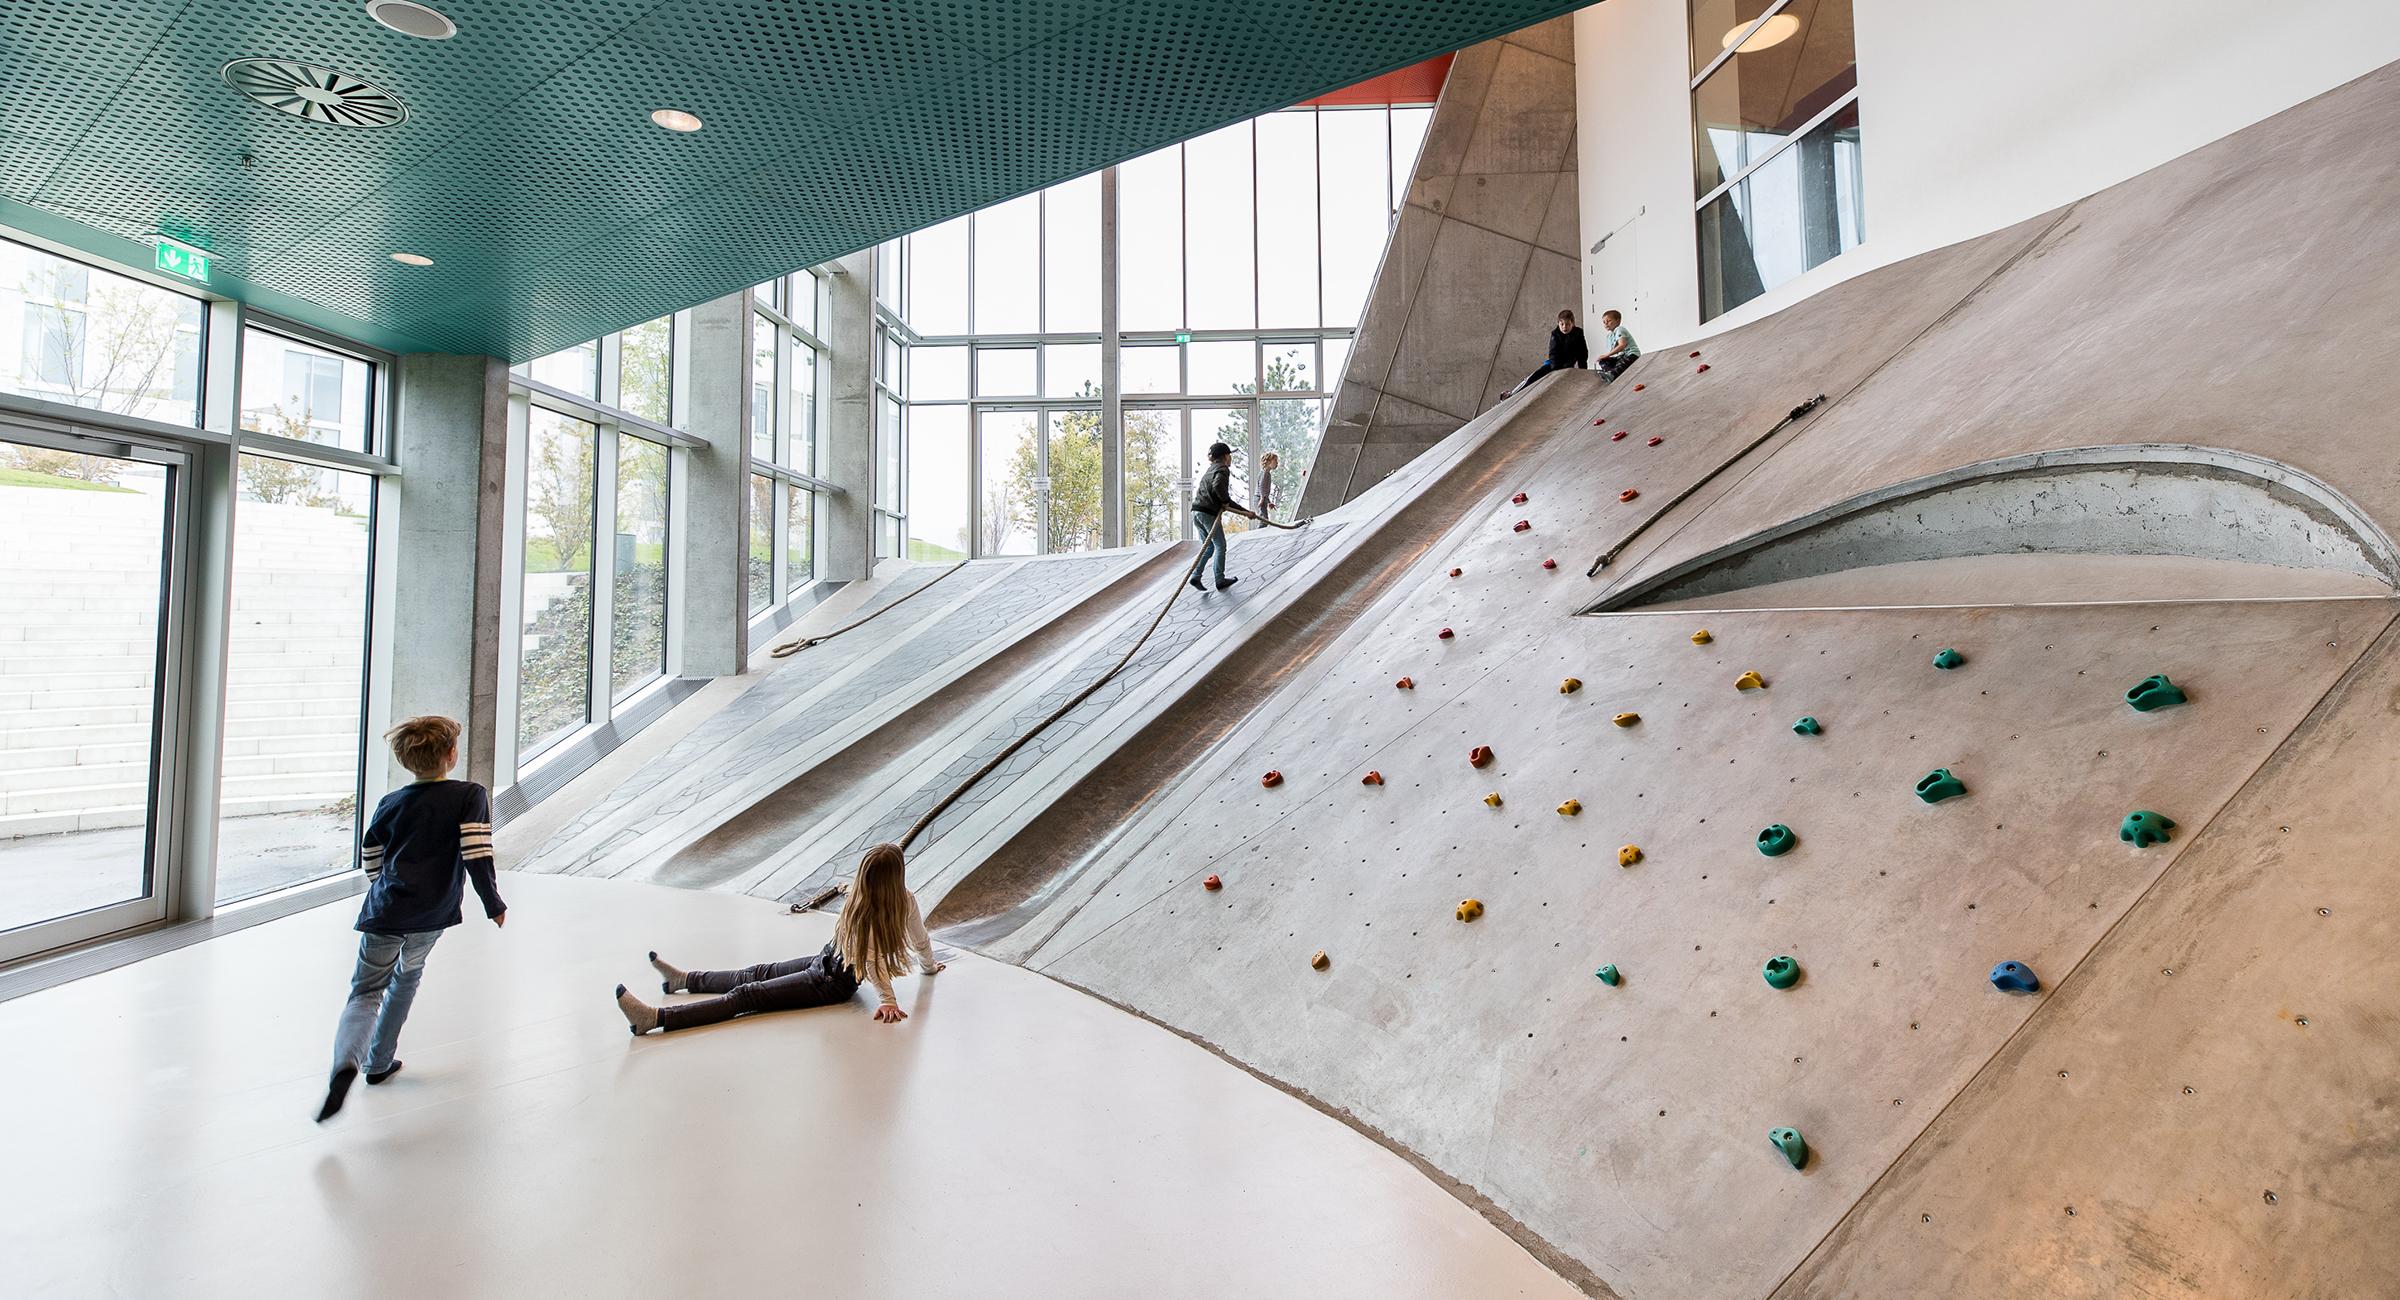 Billedet viser børn i leg på skråt betonunderlag